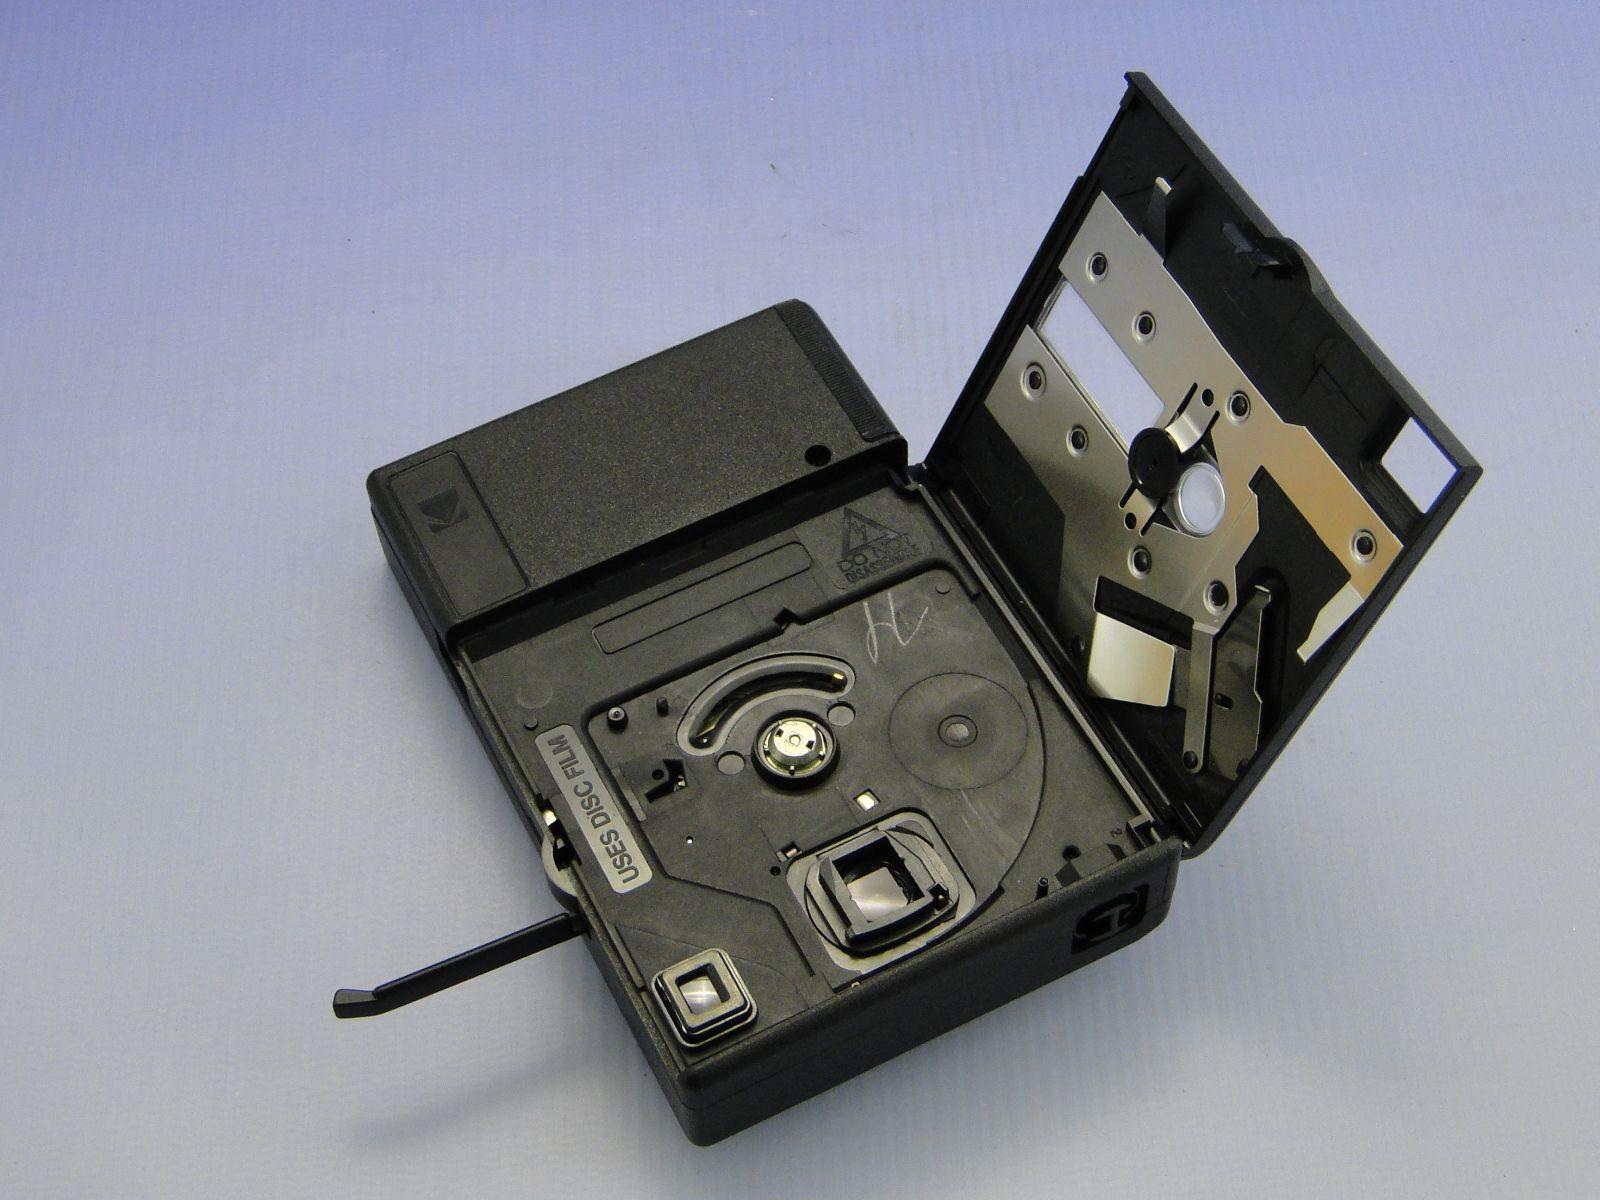 DSC09425.JPG (1600×1200)